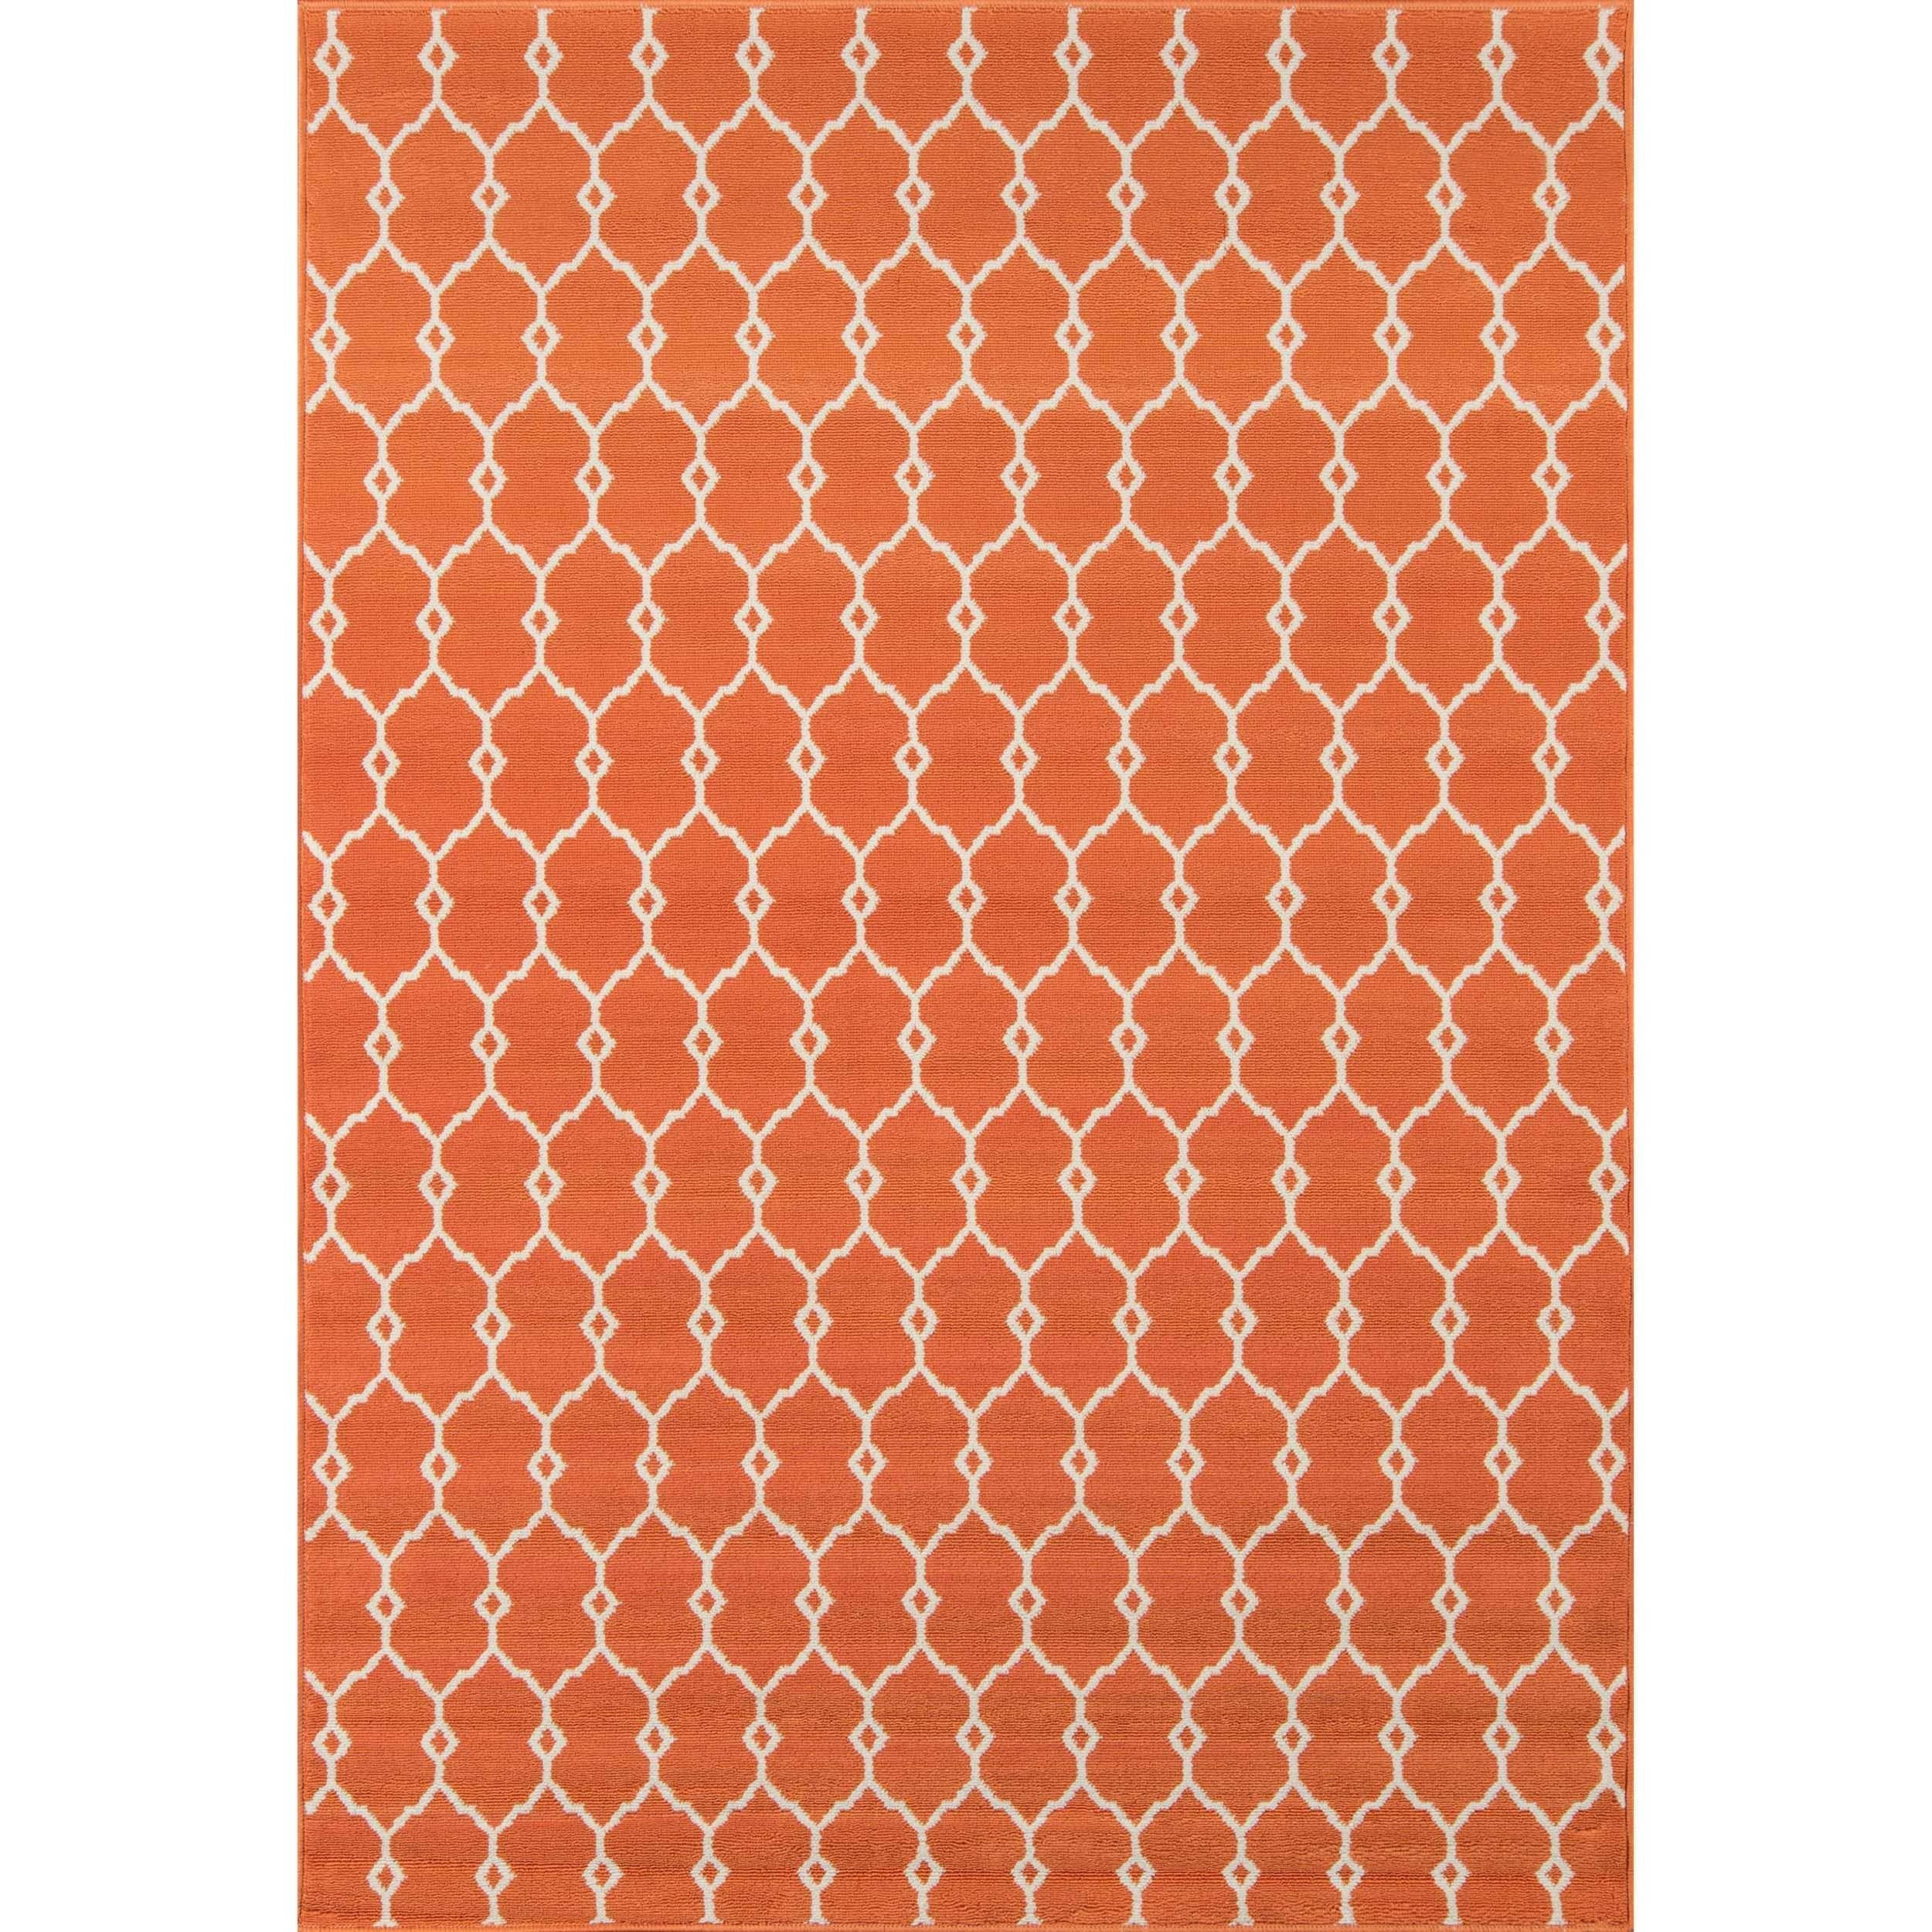 Momeni Baja Trellis Orange Indoor/Outdoor Area Rug (1'8 x 3'7)